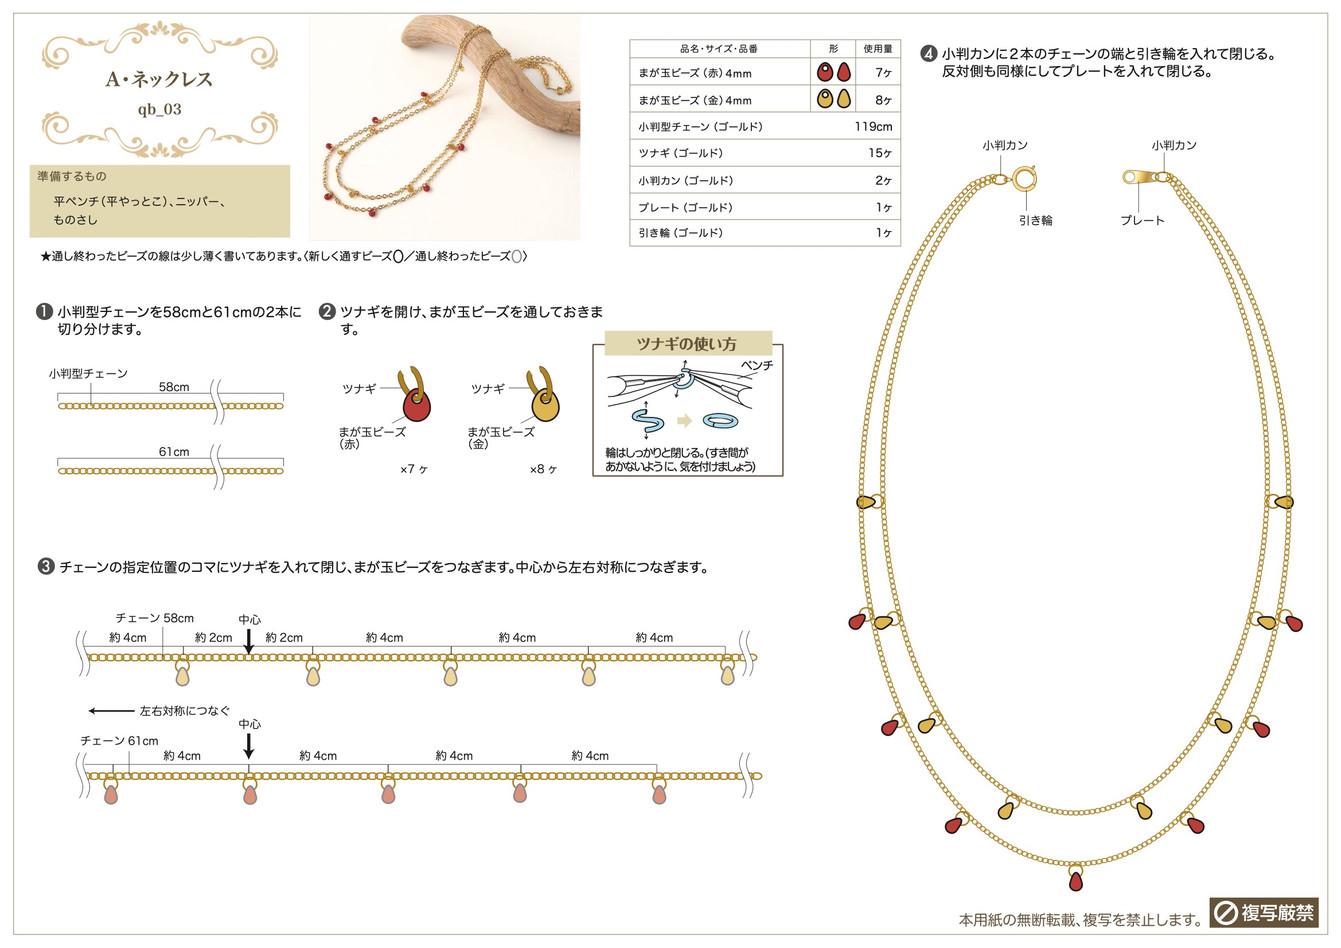 qb_03_rcp_A-neck.jpeg